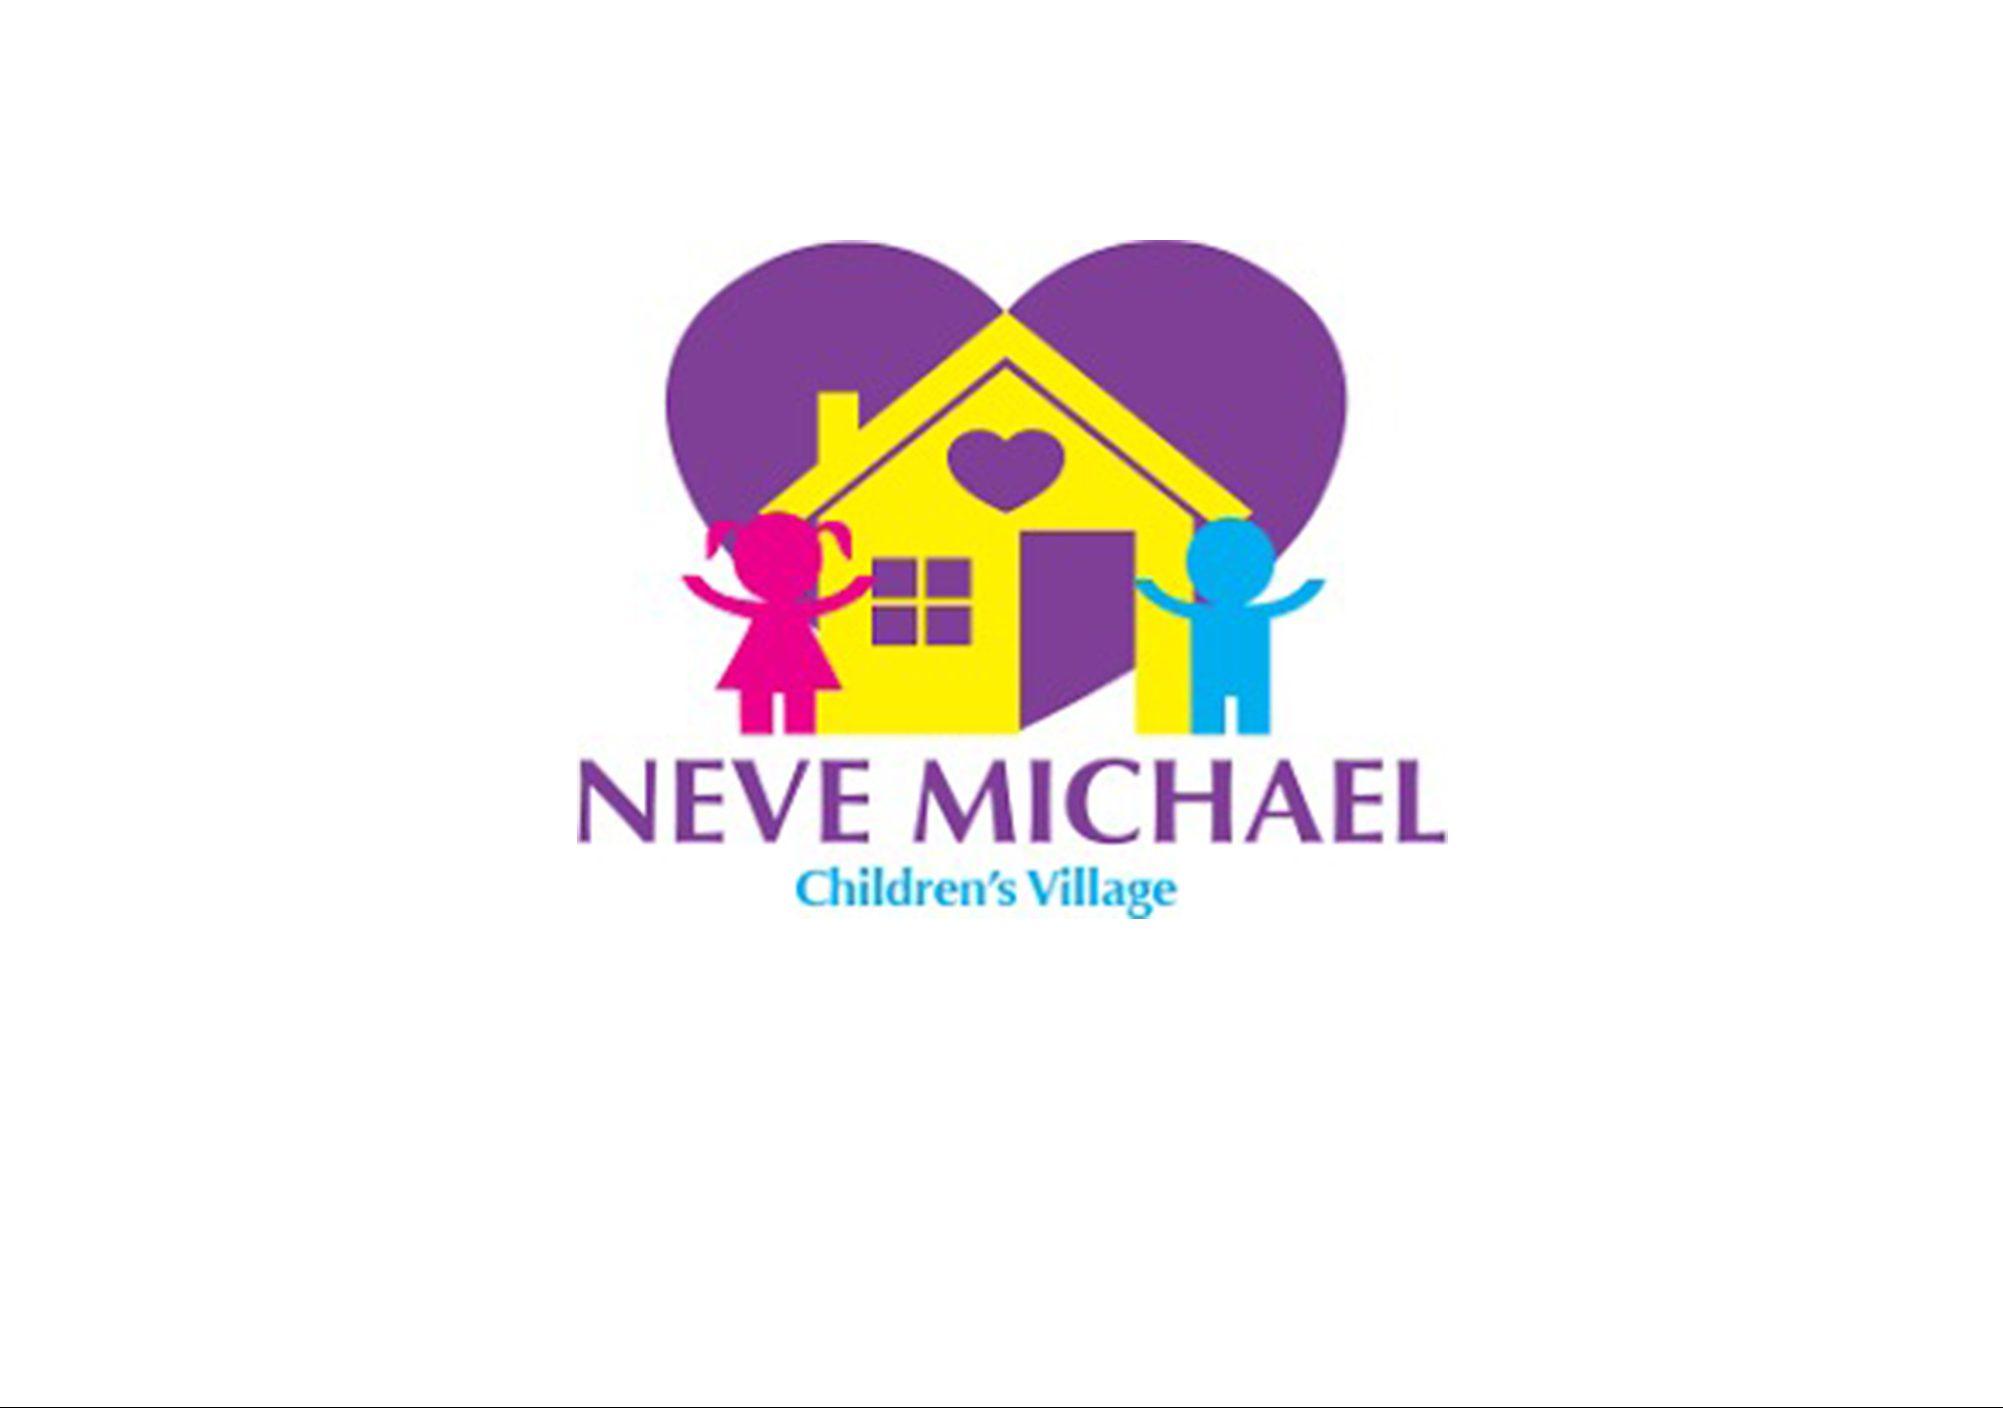 MENTORSHIP | NEVE MICHAEL